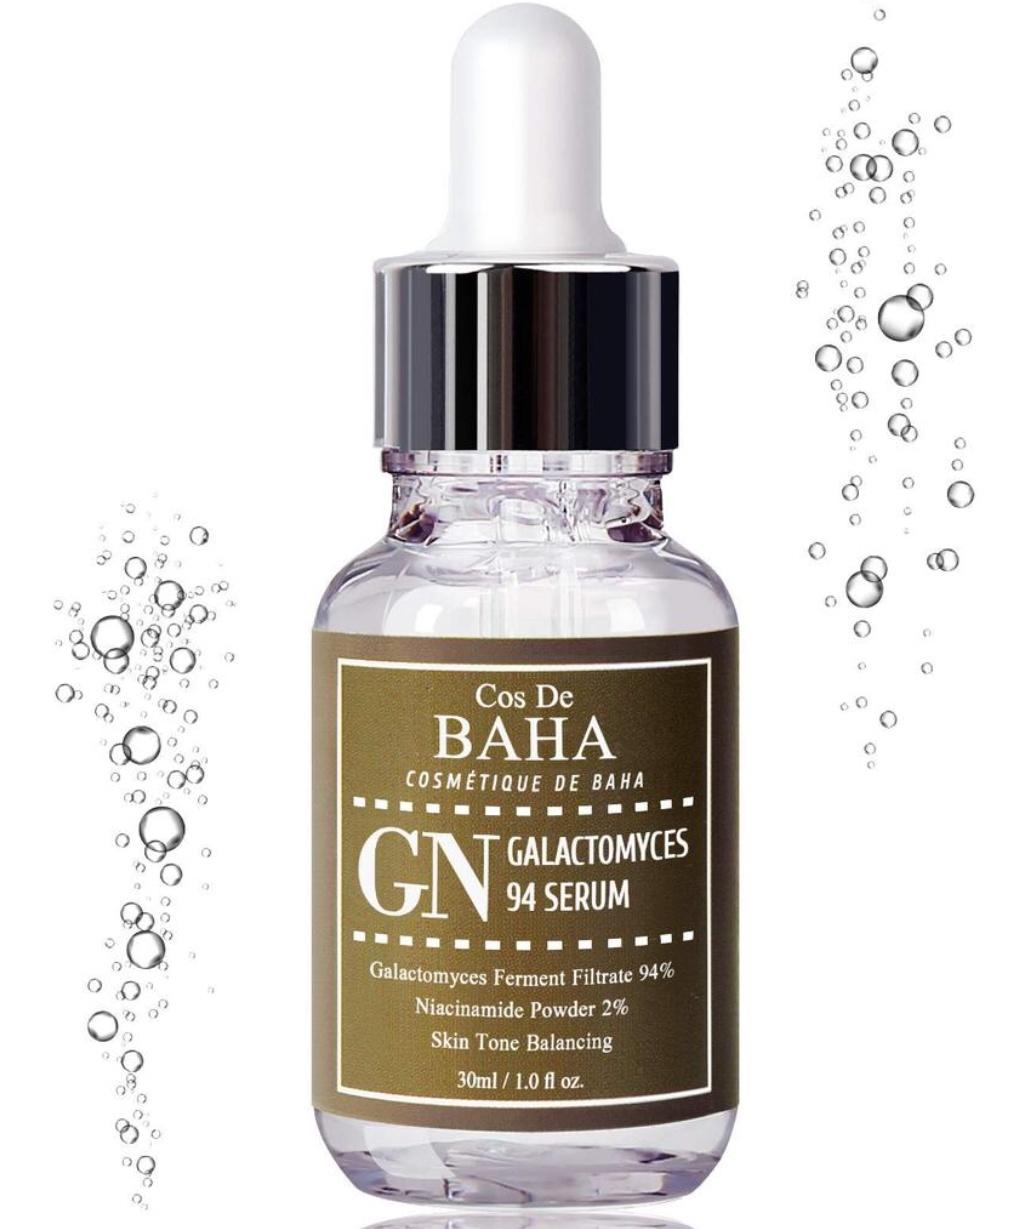 Cos De BAHA Galactomyces 94% Treatment Essence Serum